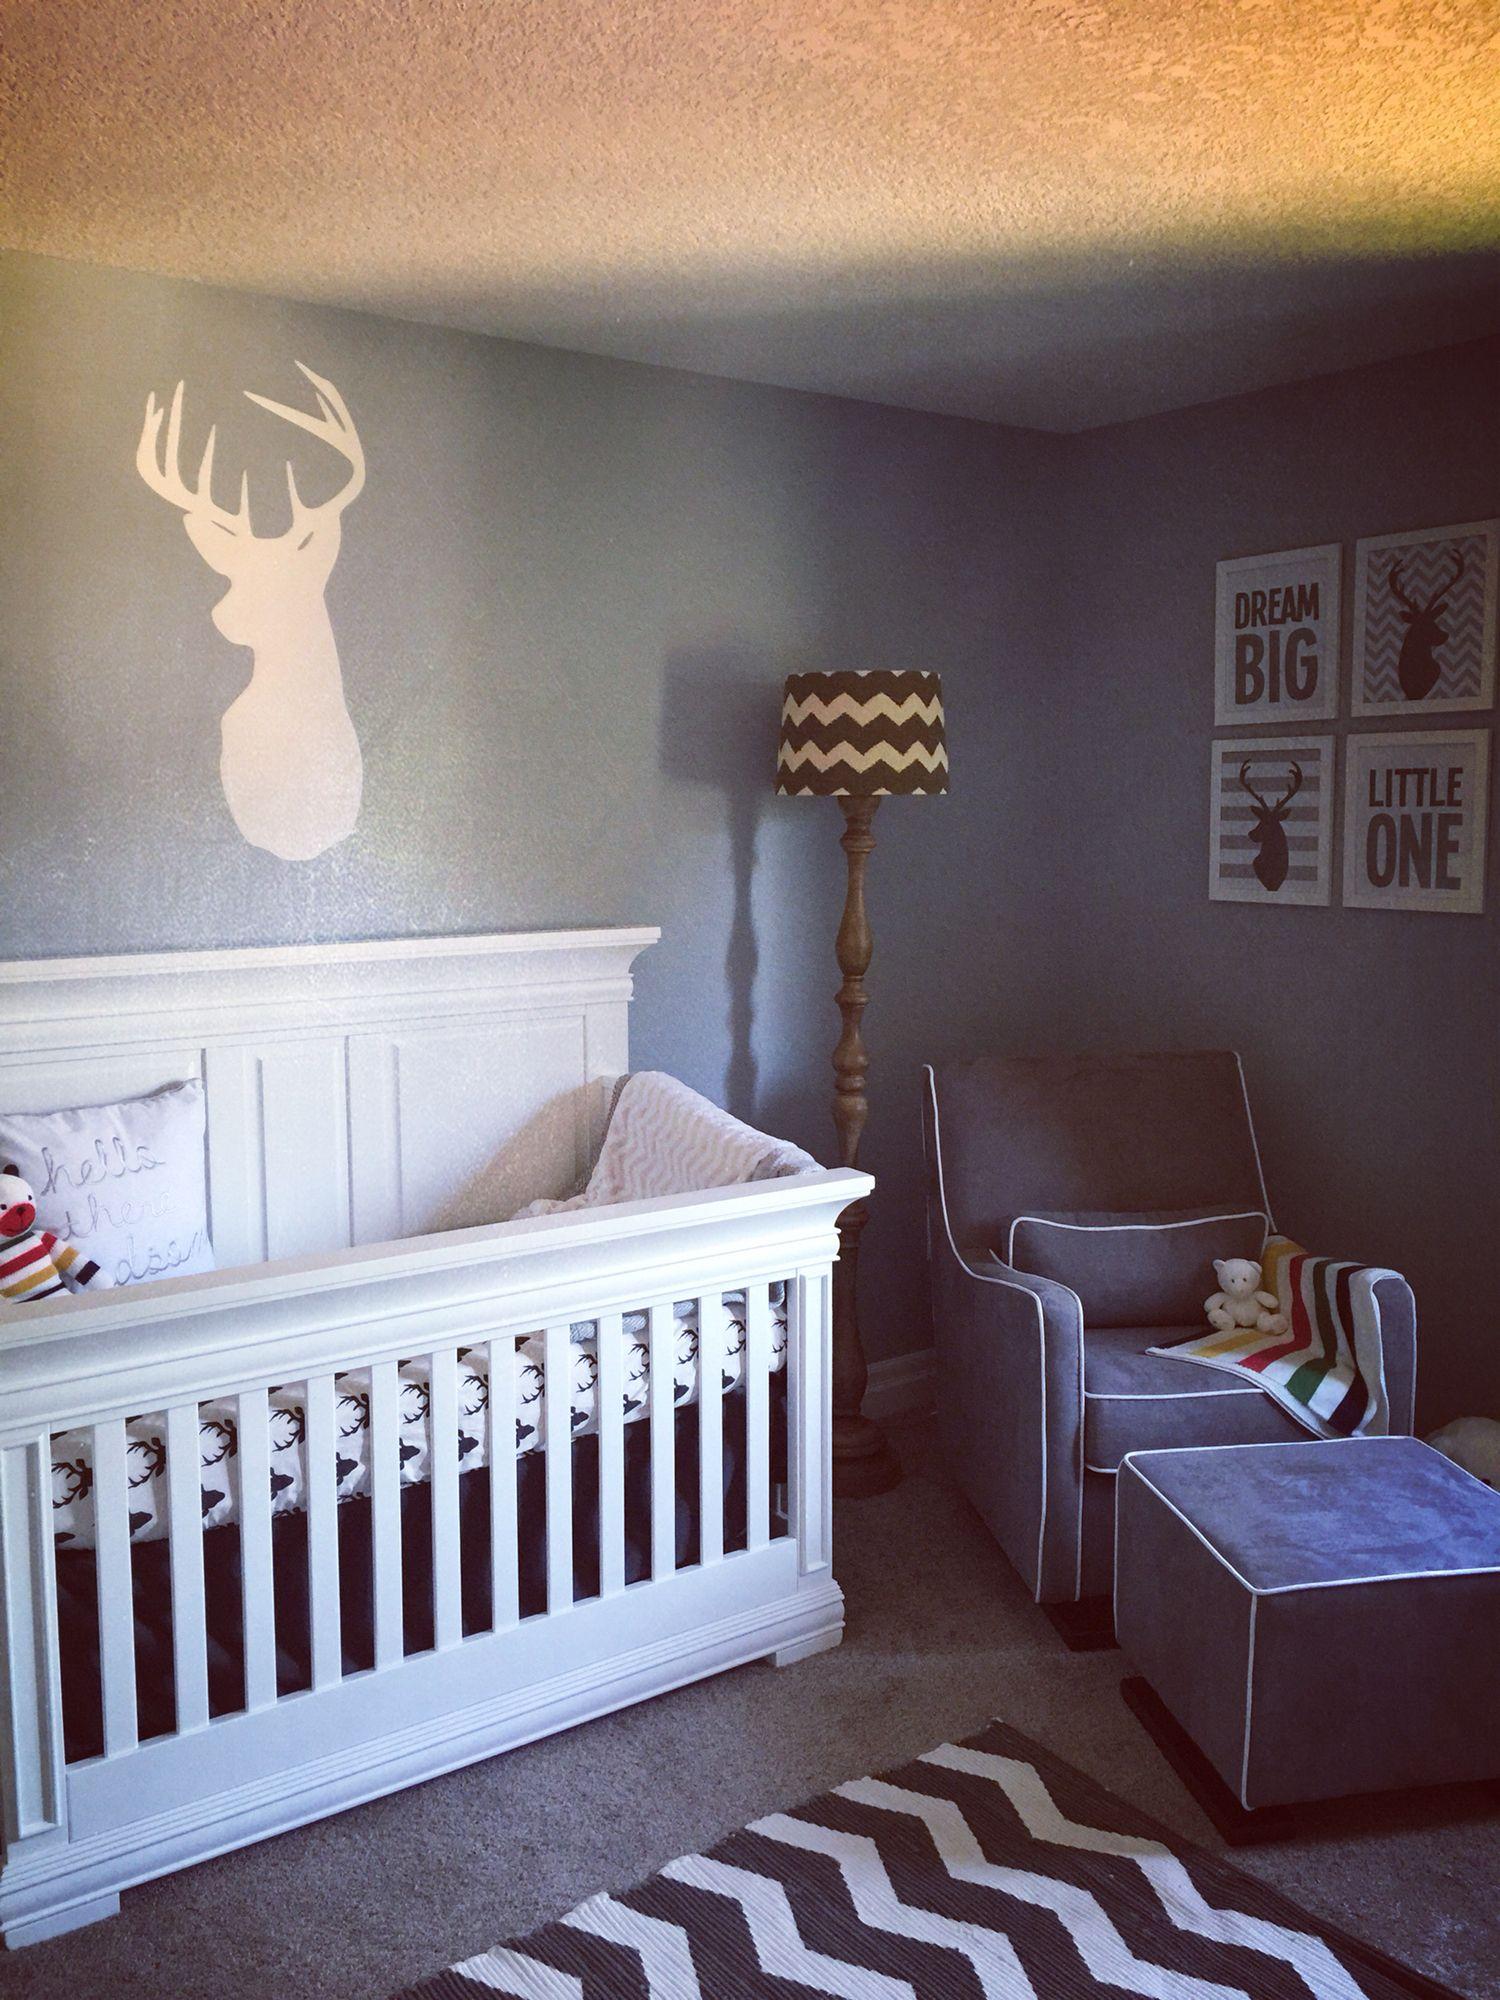 I like the setup of this nursery for Laynee's room